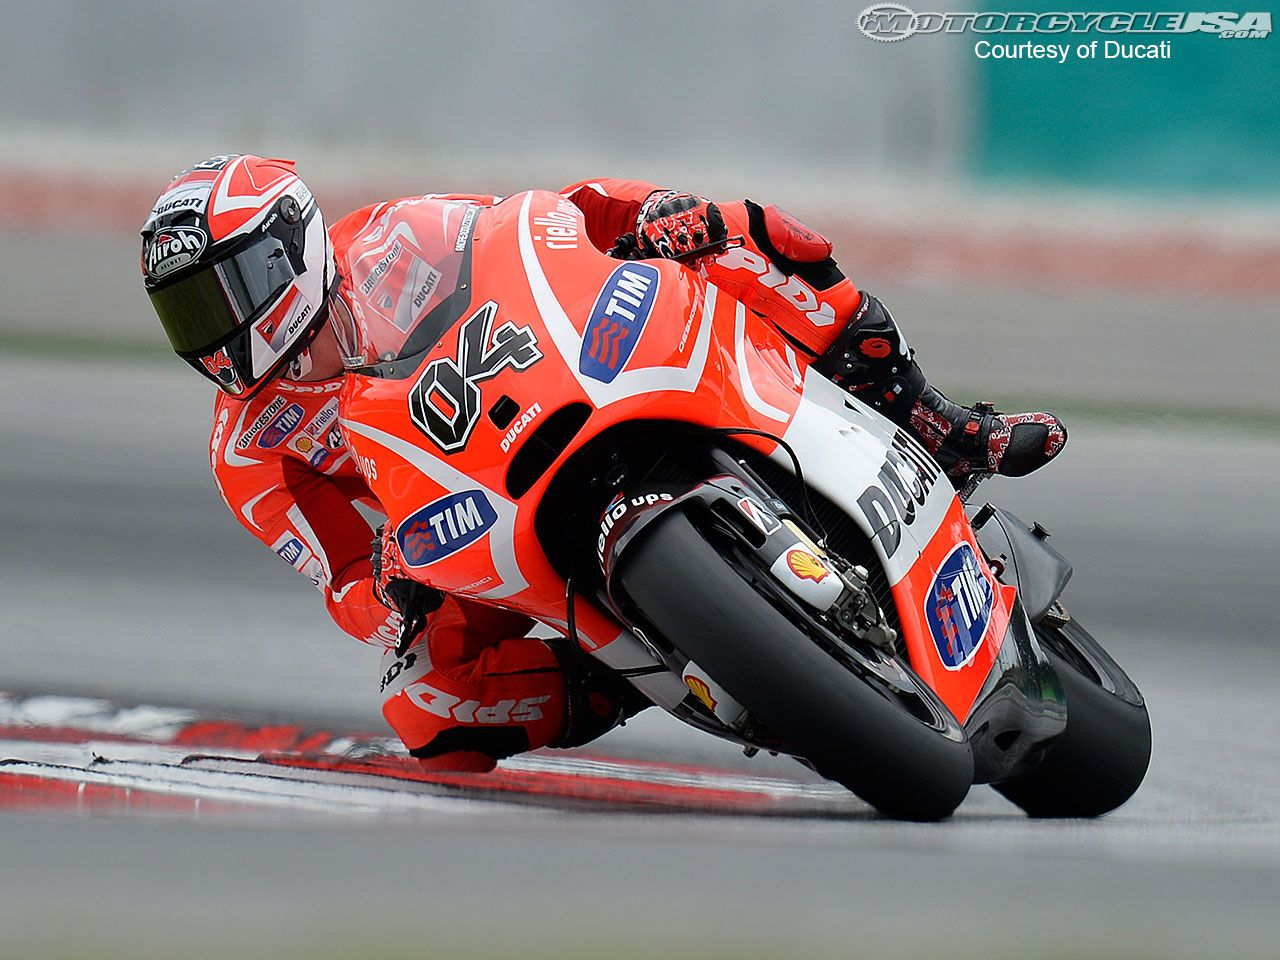 Andrea dovizioso incar podium tertinggi di motogp italia 1 italymotogphtml